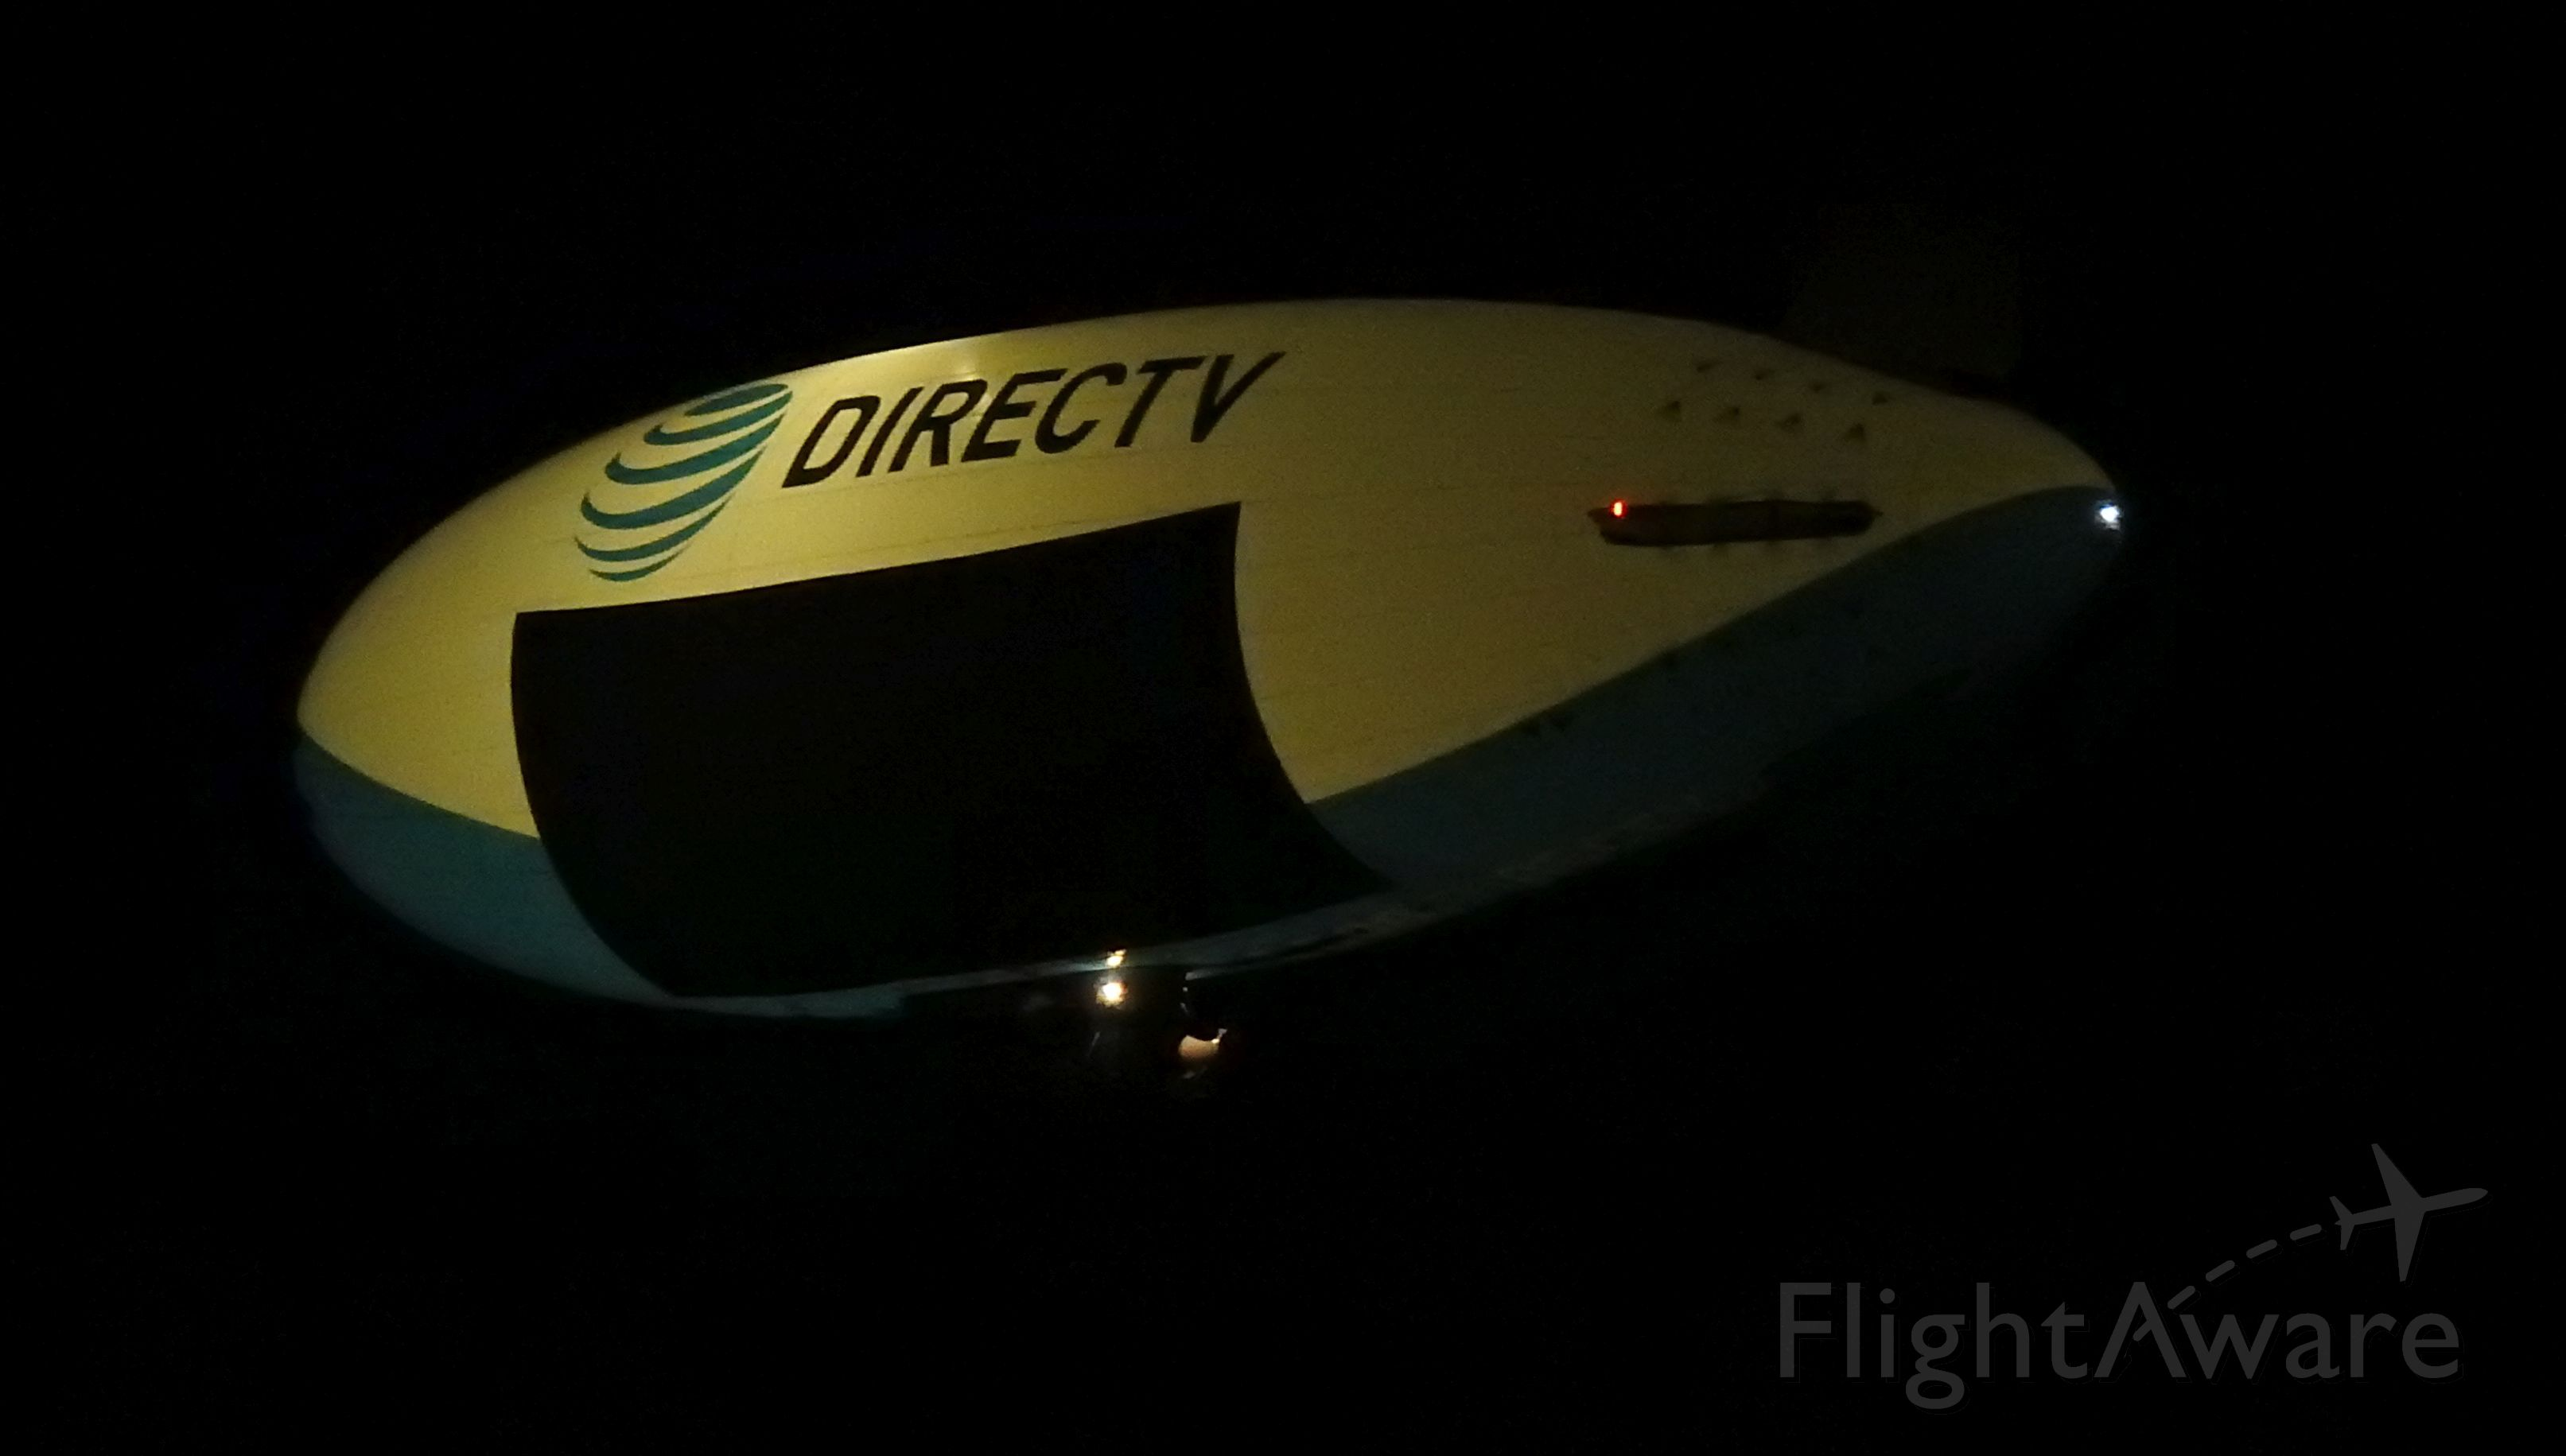 — — - DirectTV Blimp seen west of Fort Lauderdale Fl 12/15/16 a rel=nofollow href=http://twitter.com/dtvblimphttps://twitter.com/dtvblimp/a